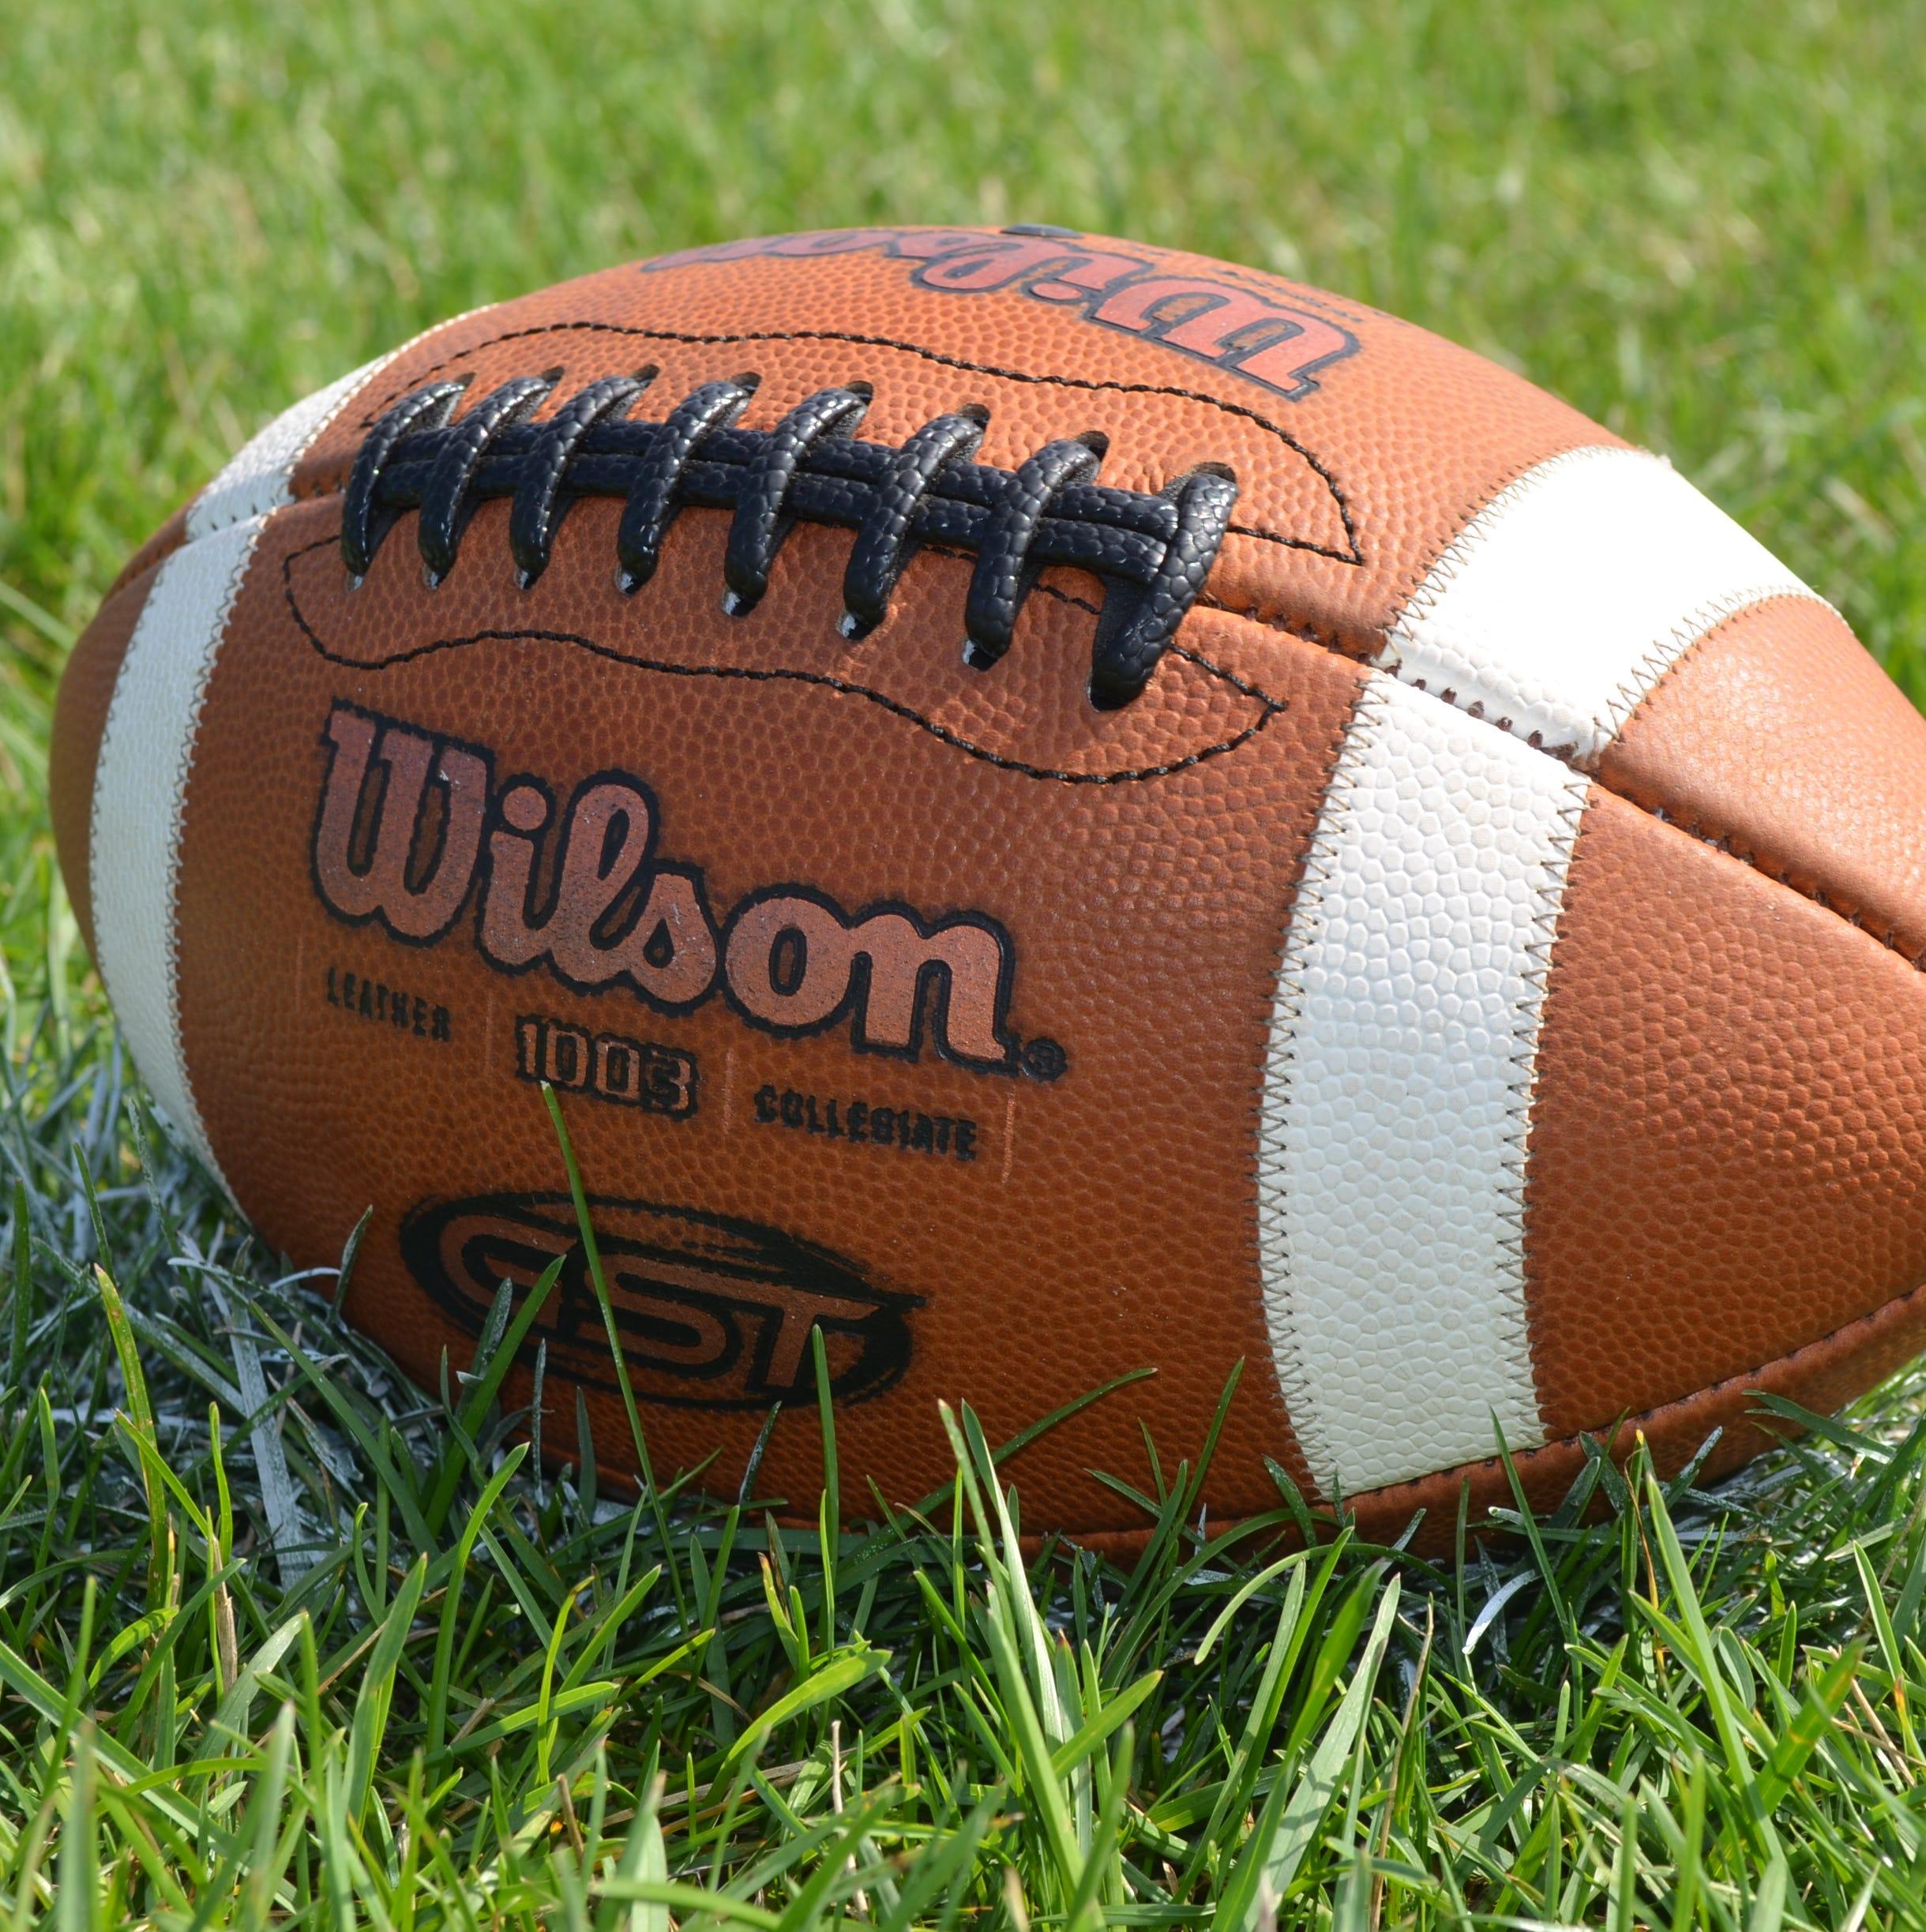 Battle Creek Enquirer's Top 10 high school football players for 2018